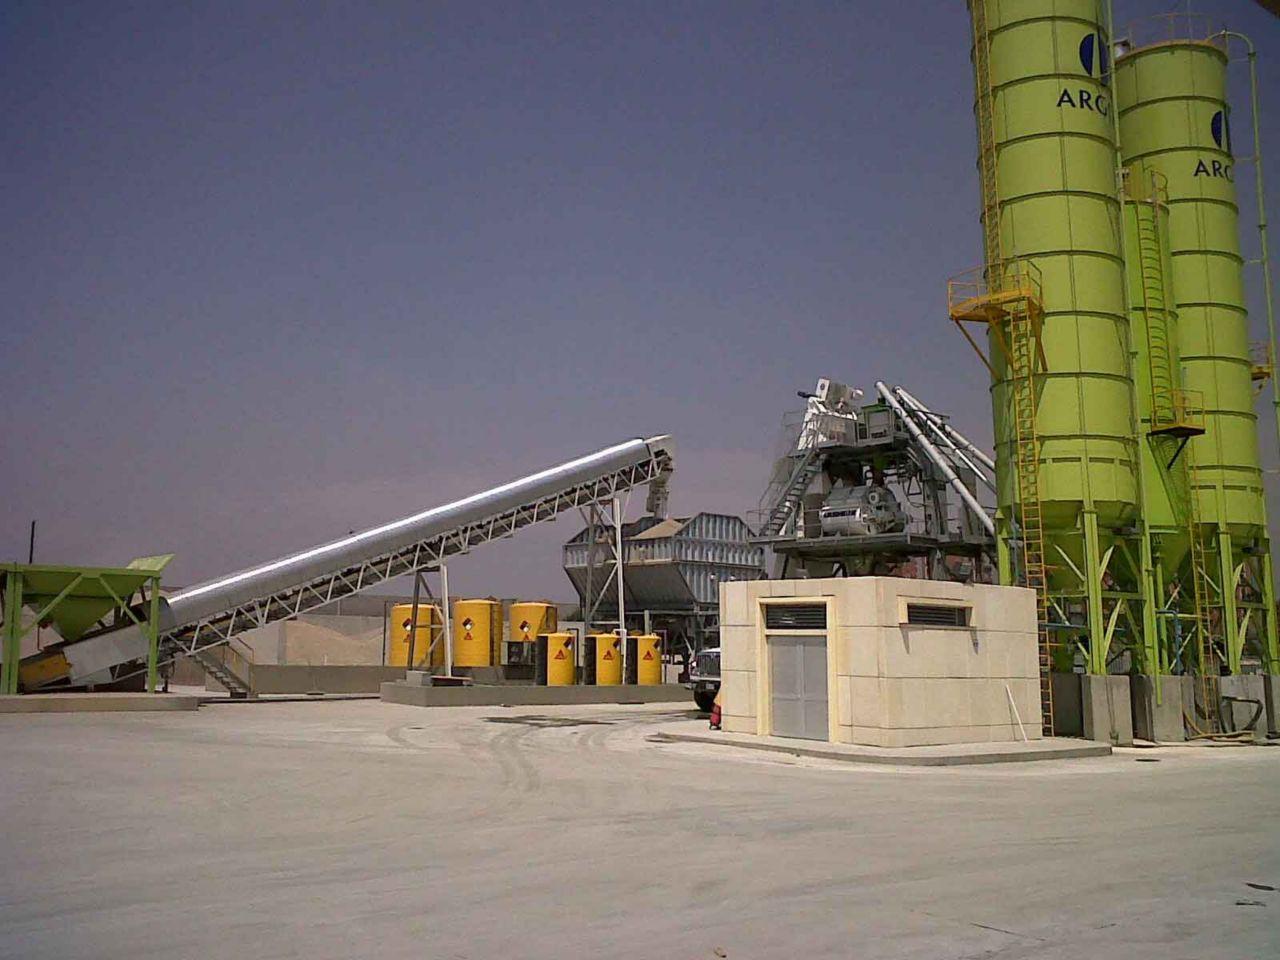 Argos production site